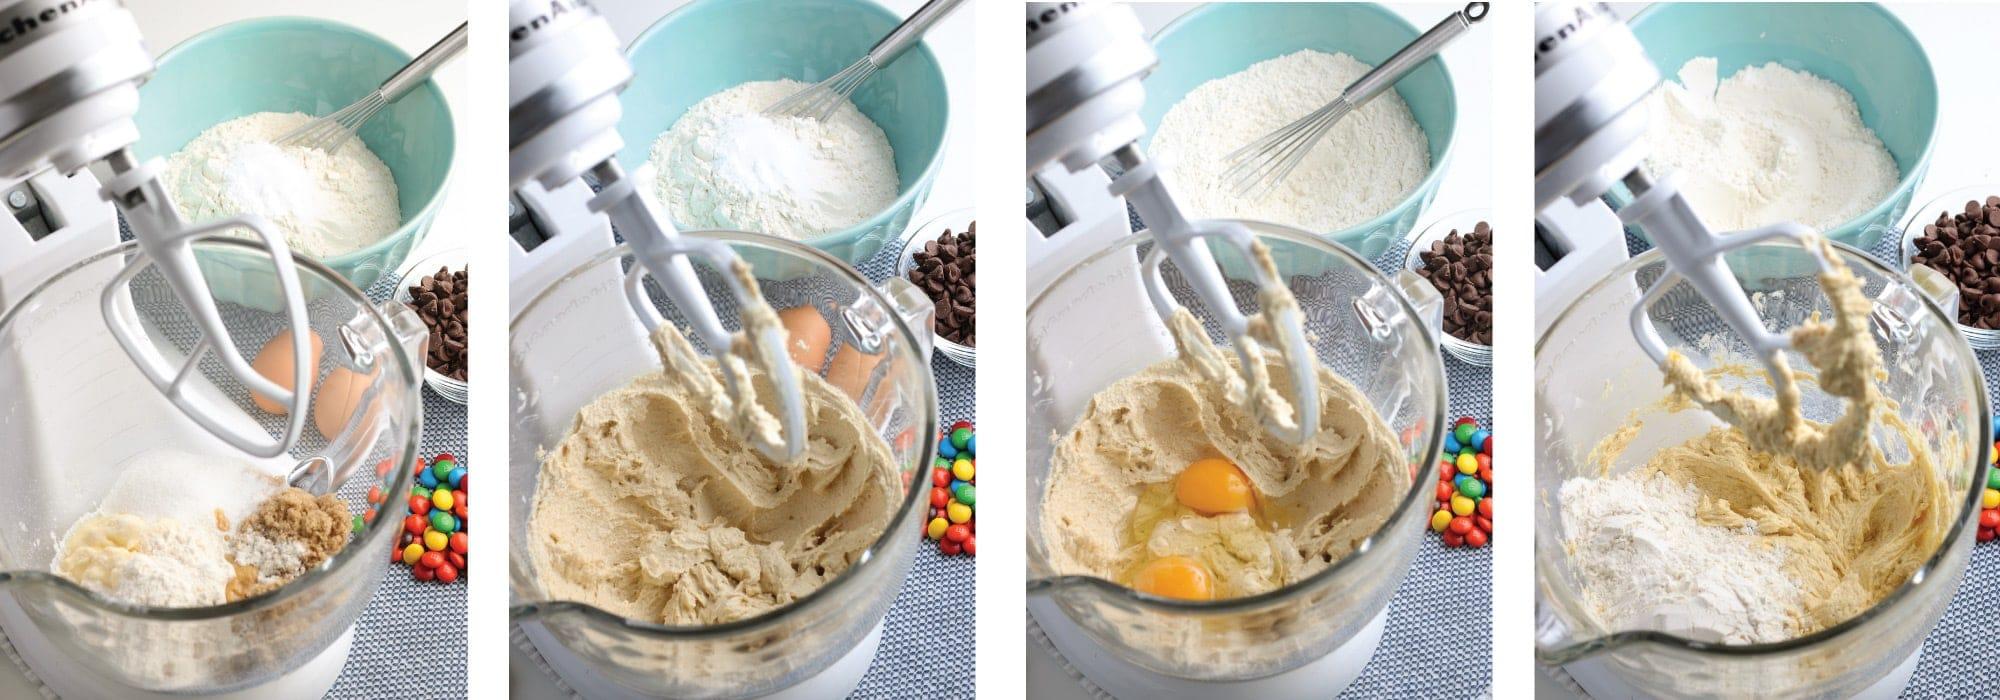 M&M Cookie dough in mixer